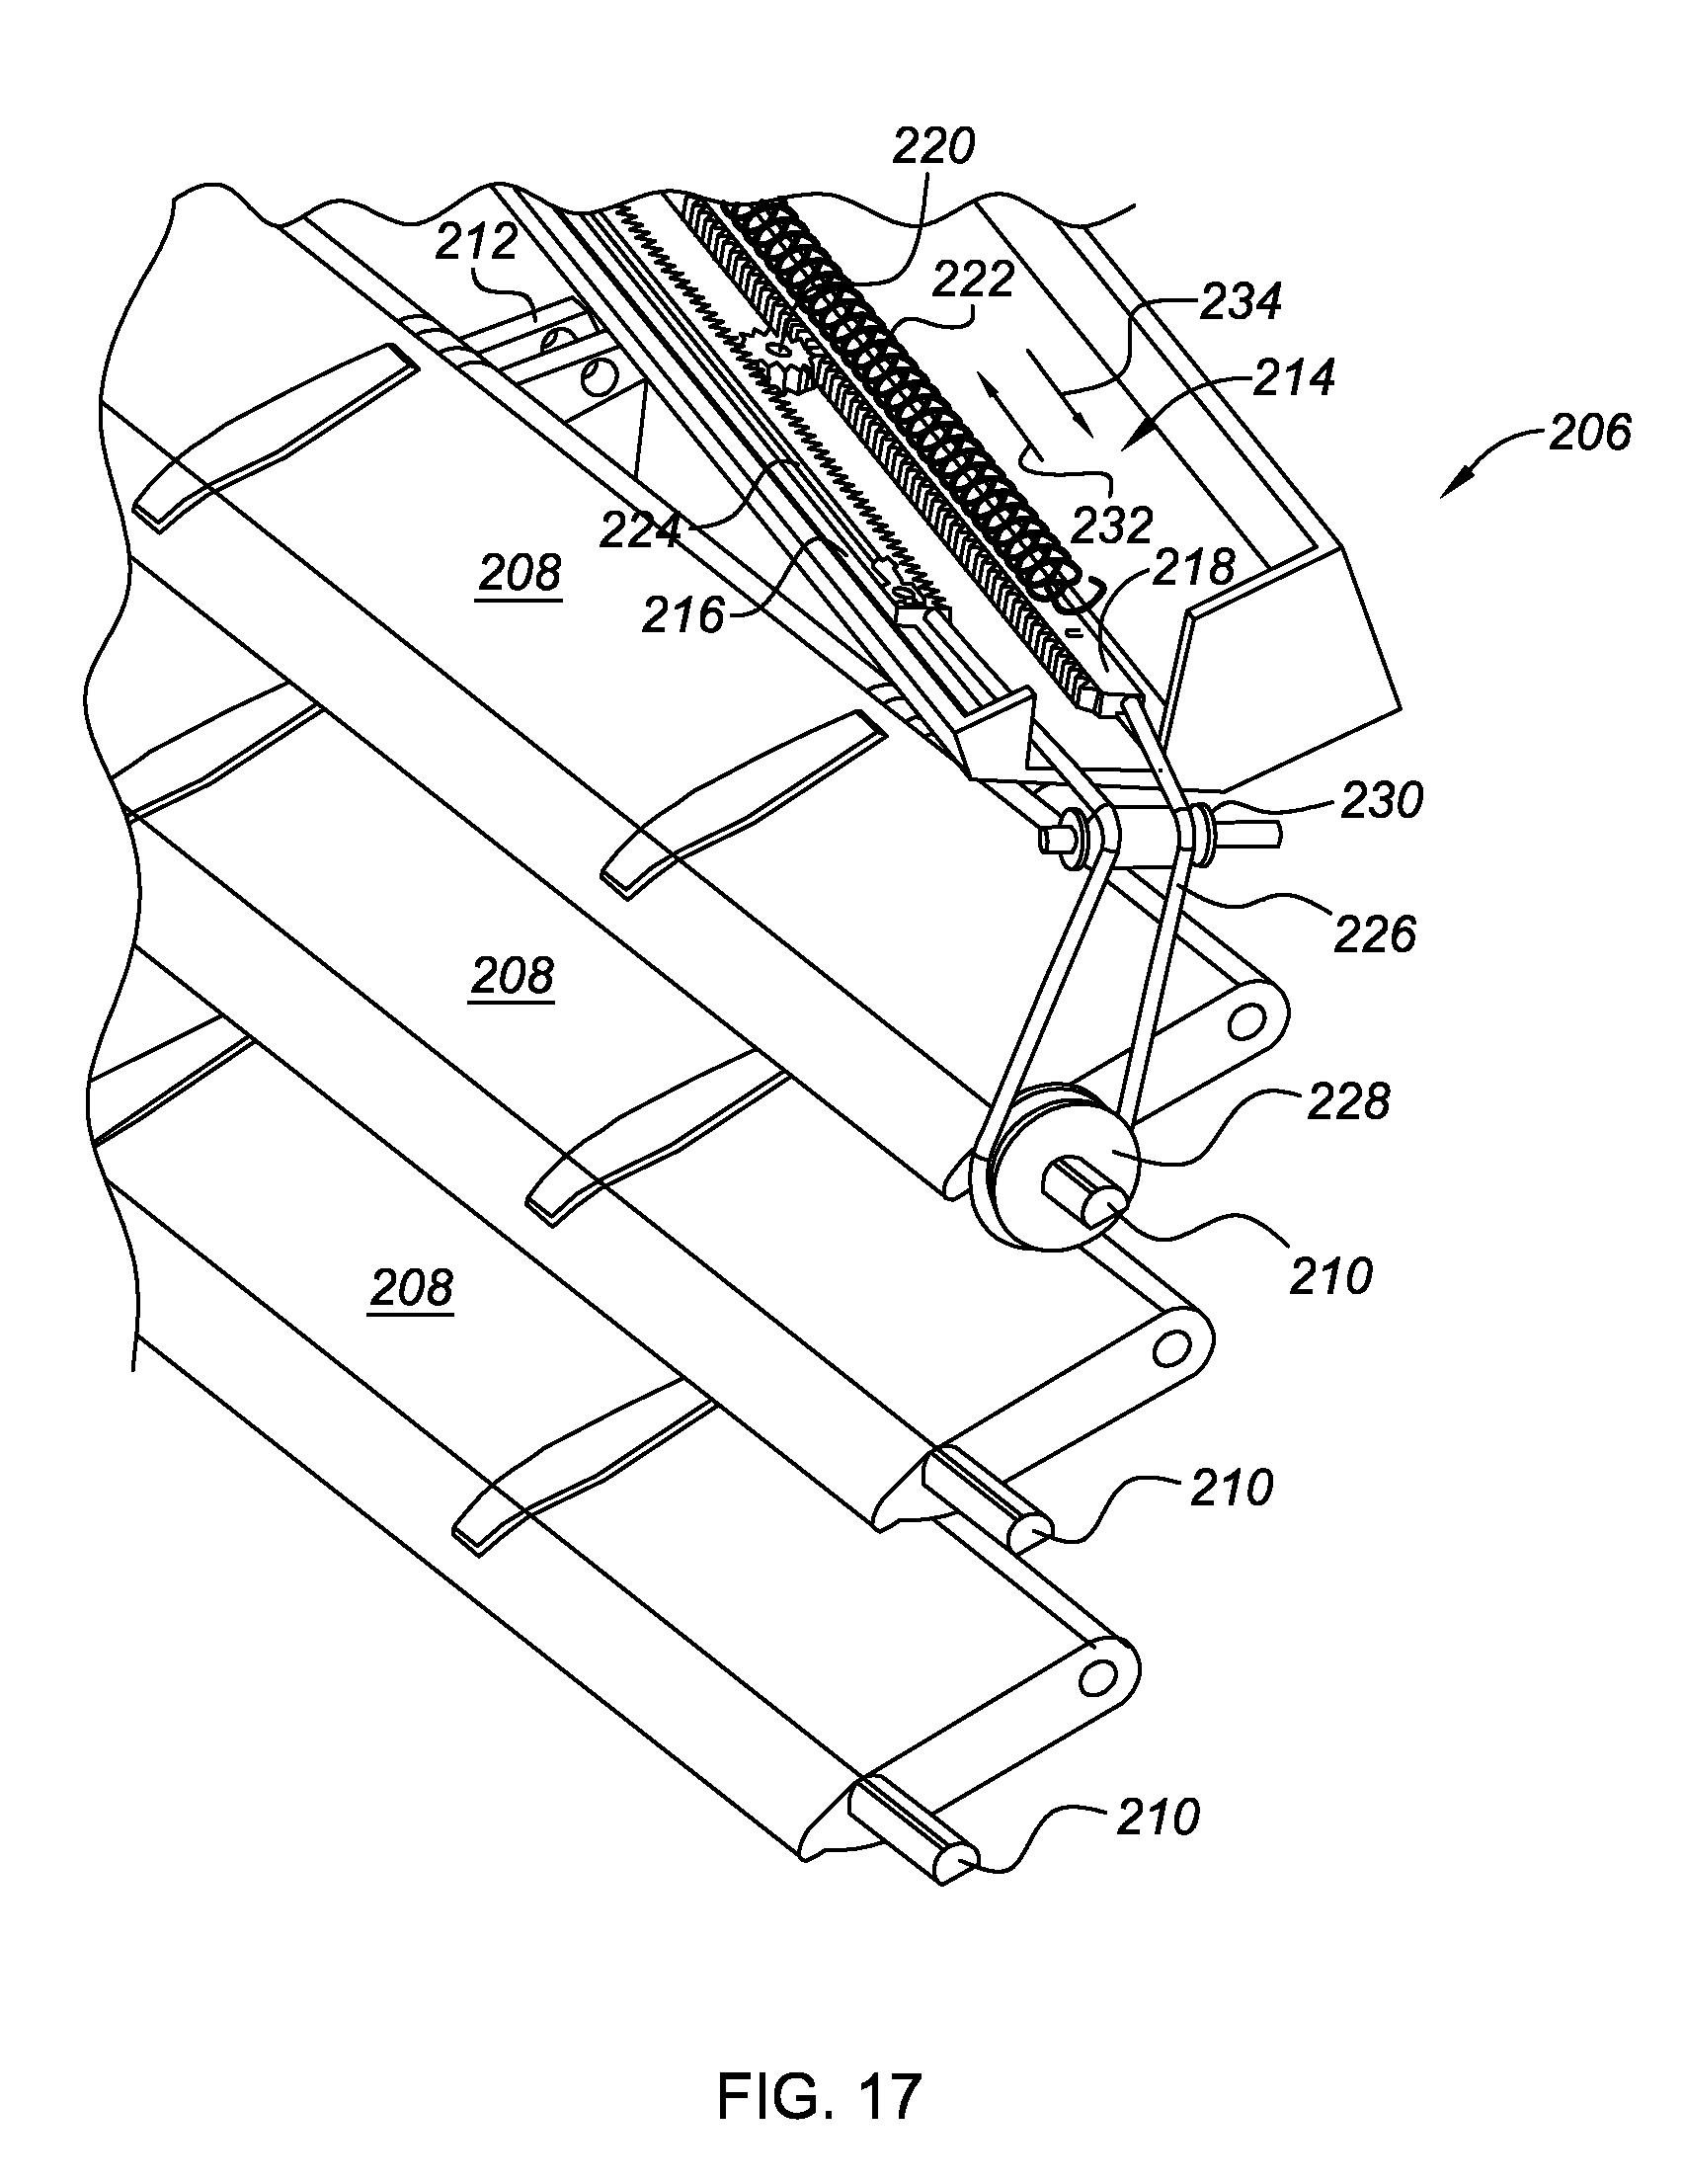 [DIAGRAM] Side Mirror Toyota Tacoma Fuse Box Diagram FULL